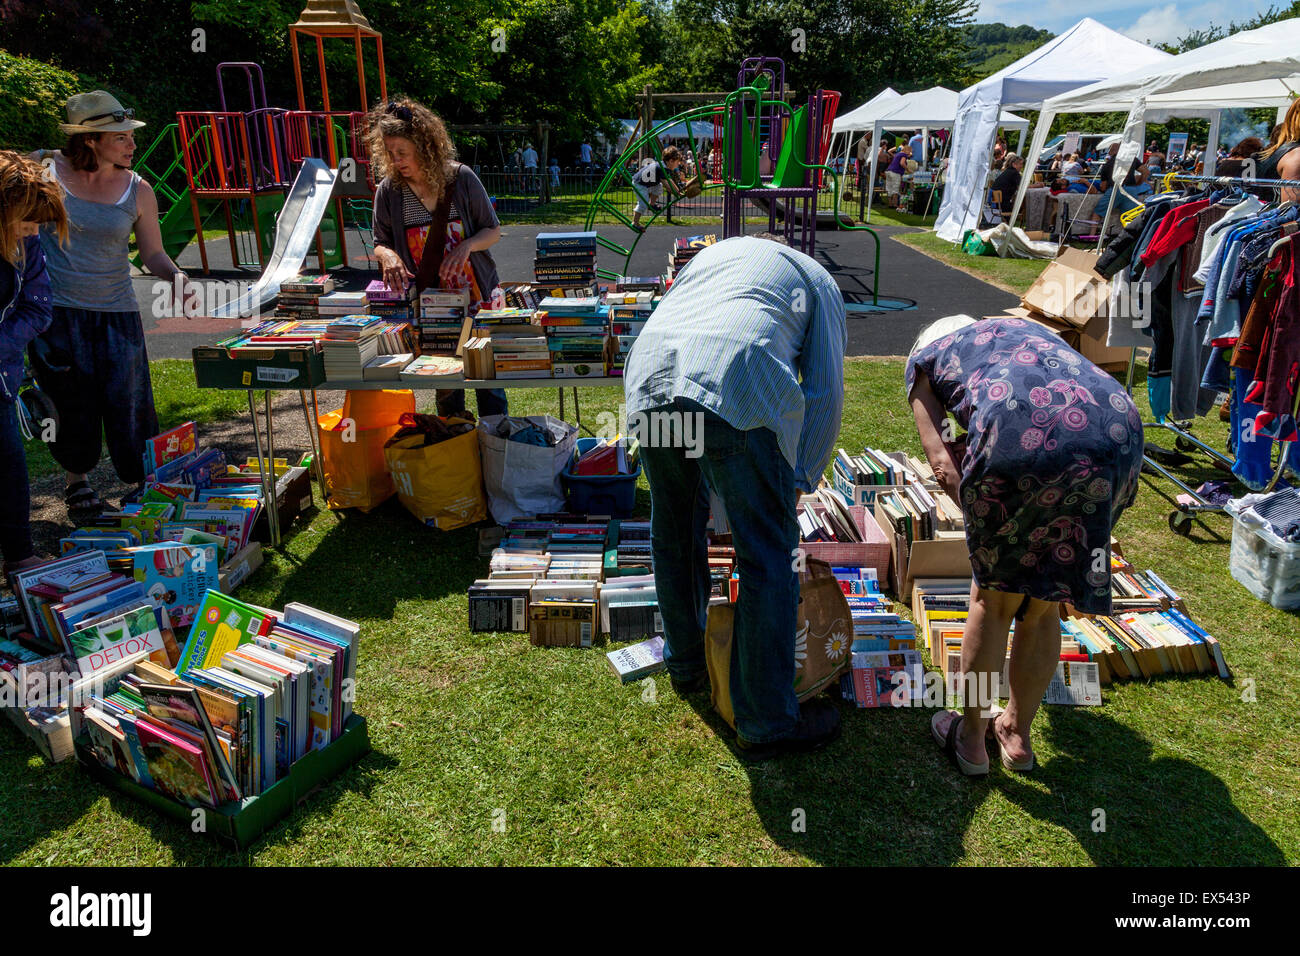 Second Hand Books For Sale, Kingston Village Fete, Kingston, Sussex, UK - Stock Image